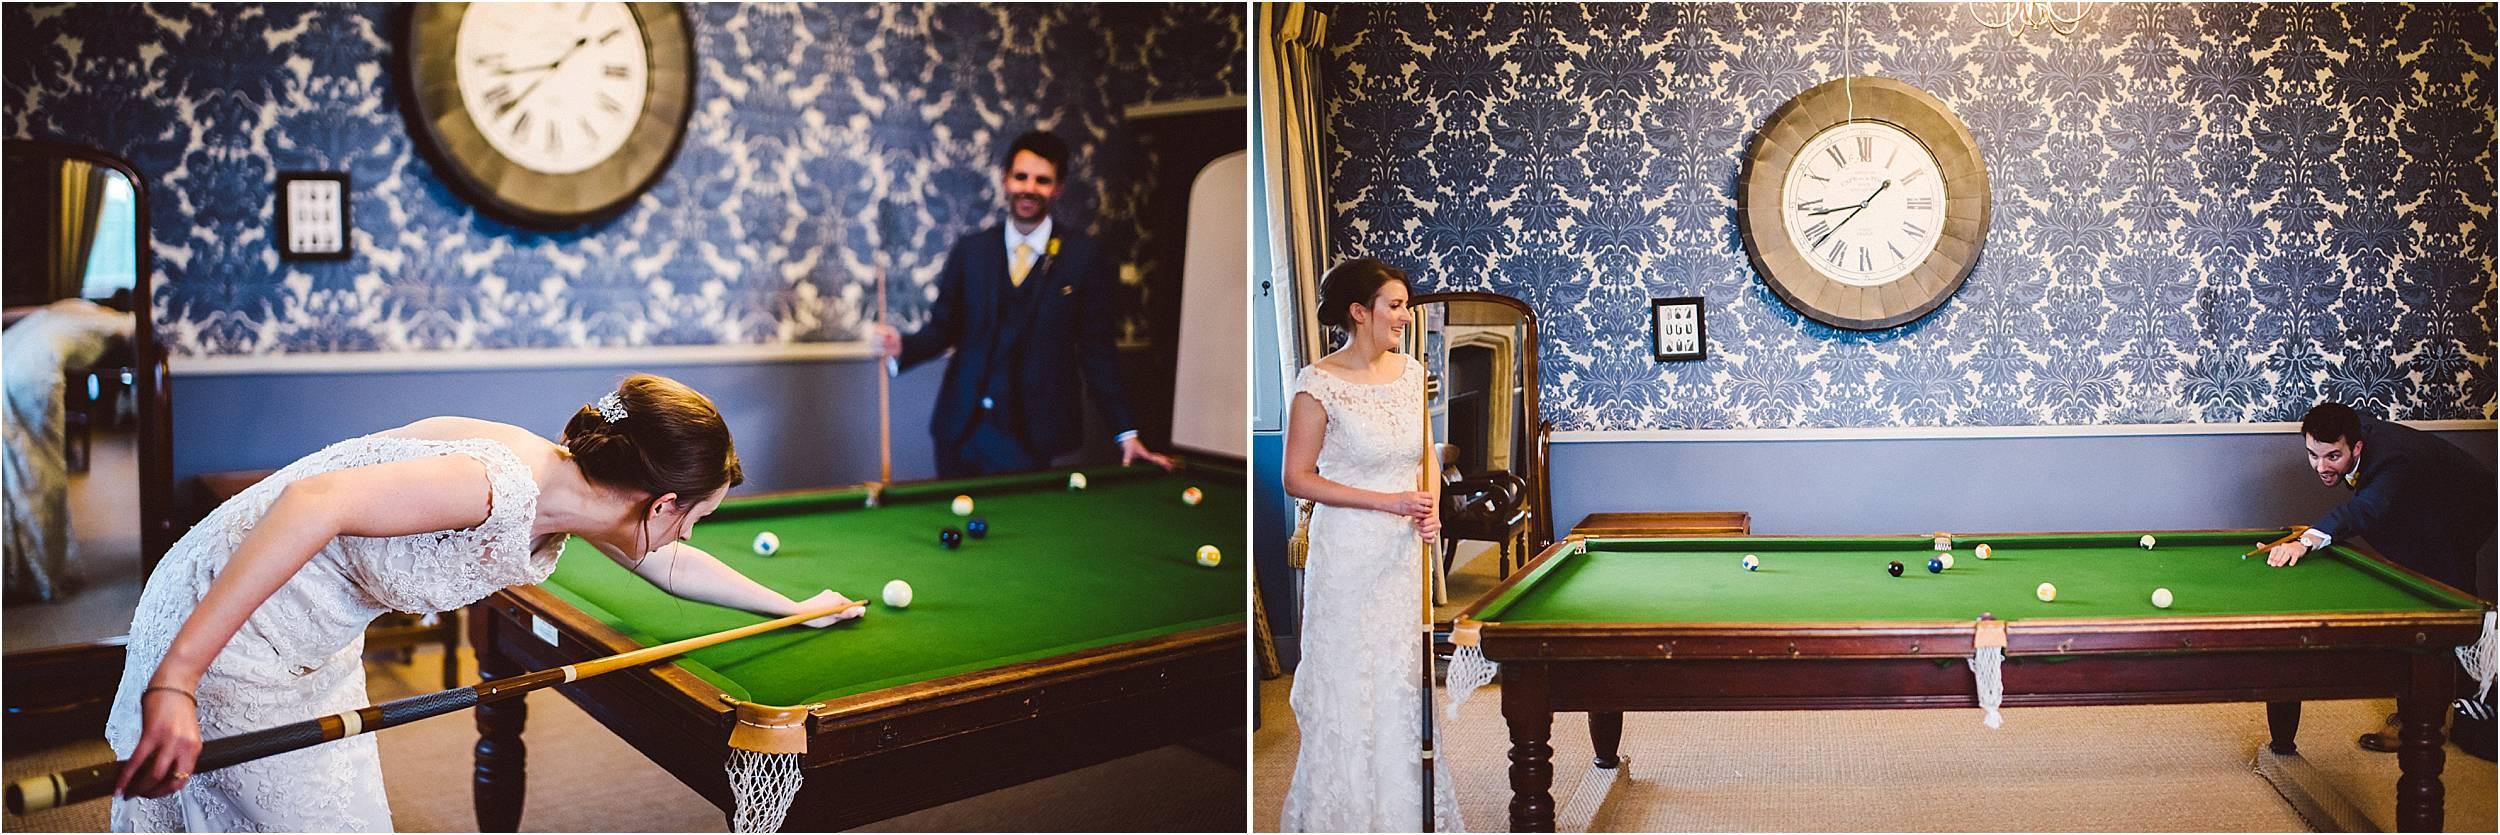 Hengrave Hall Wedding Photographer_0225.jpg